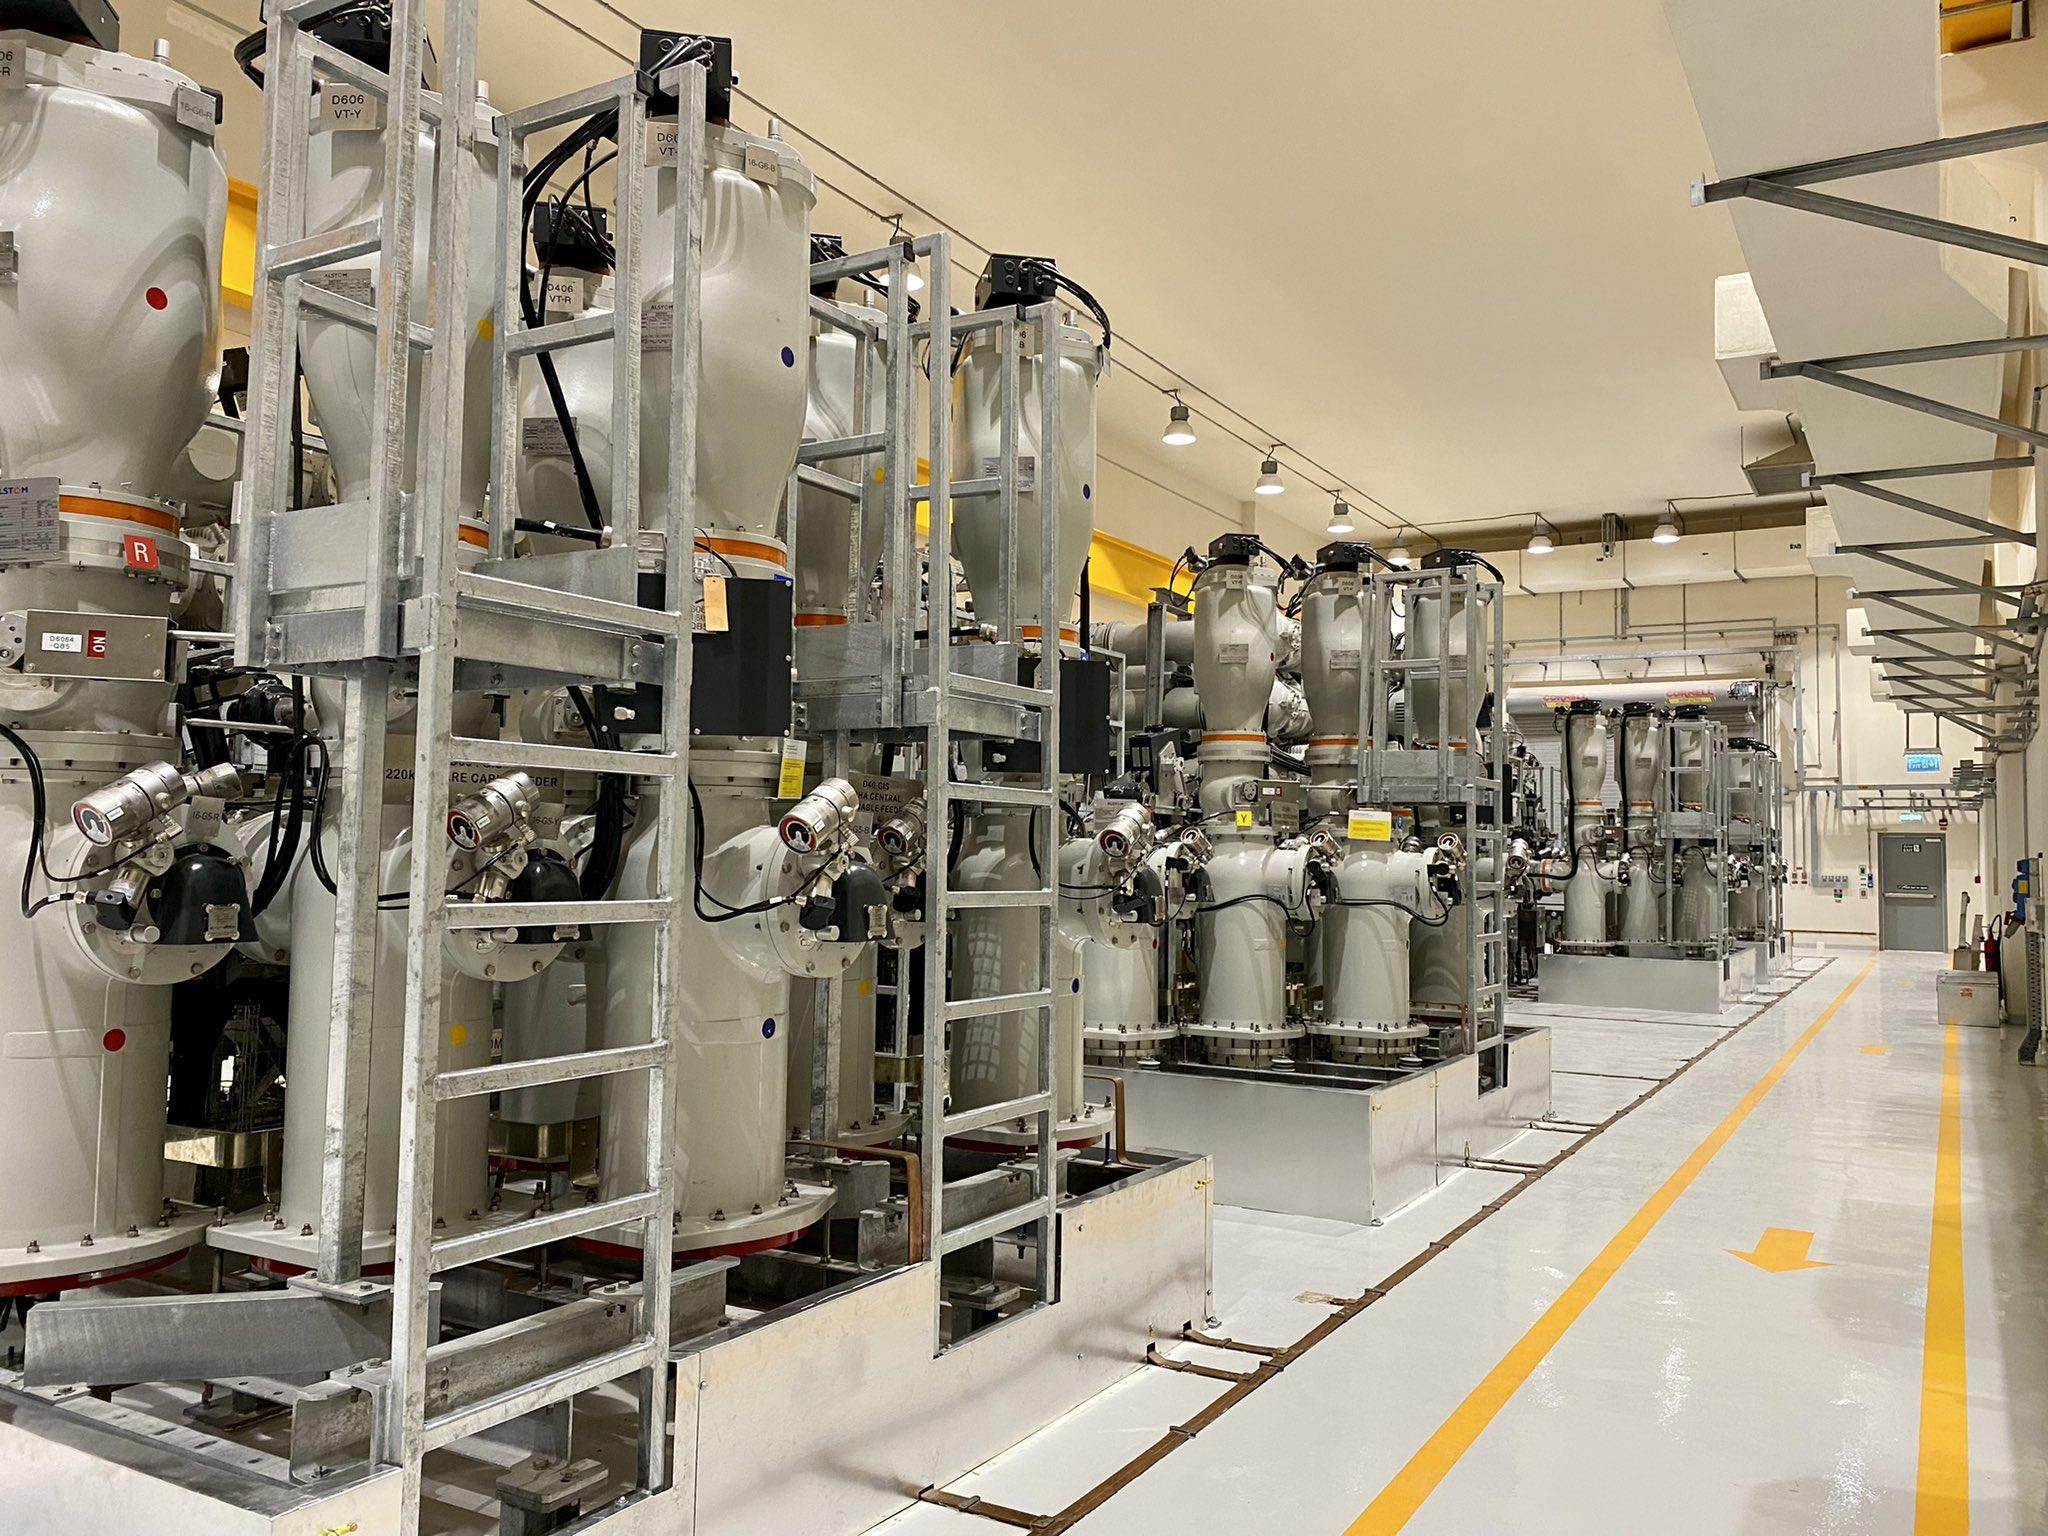 KAHRAMAA Inaugurates Hamad Medical City Super Substation